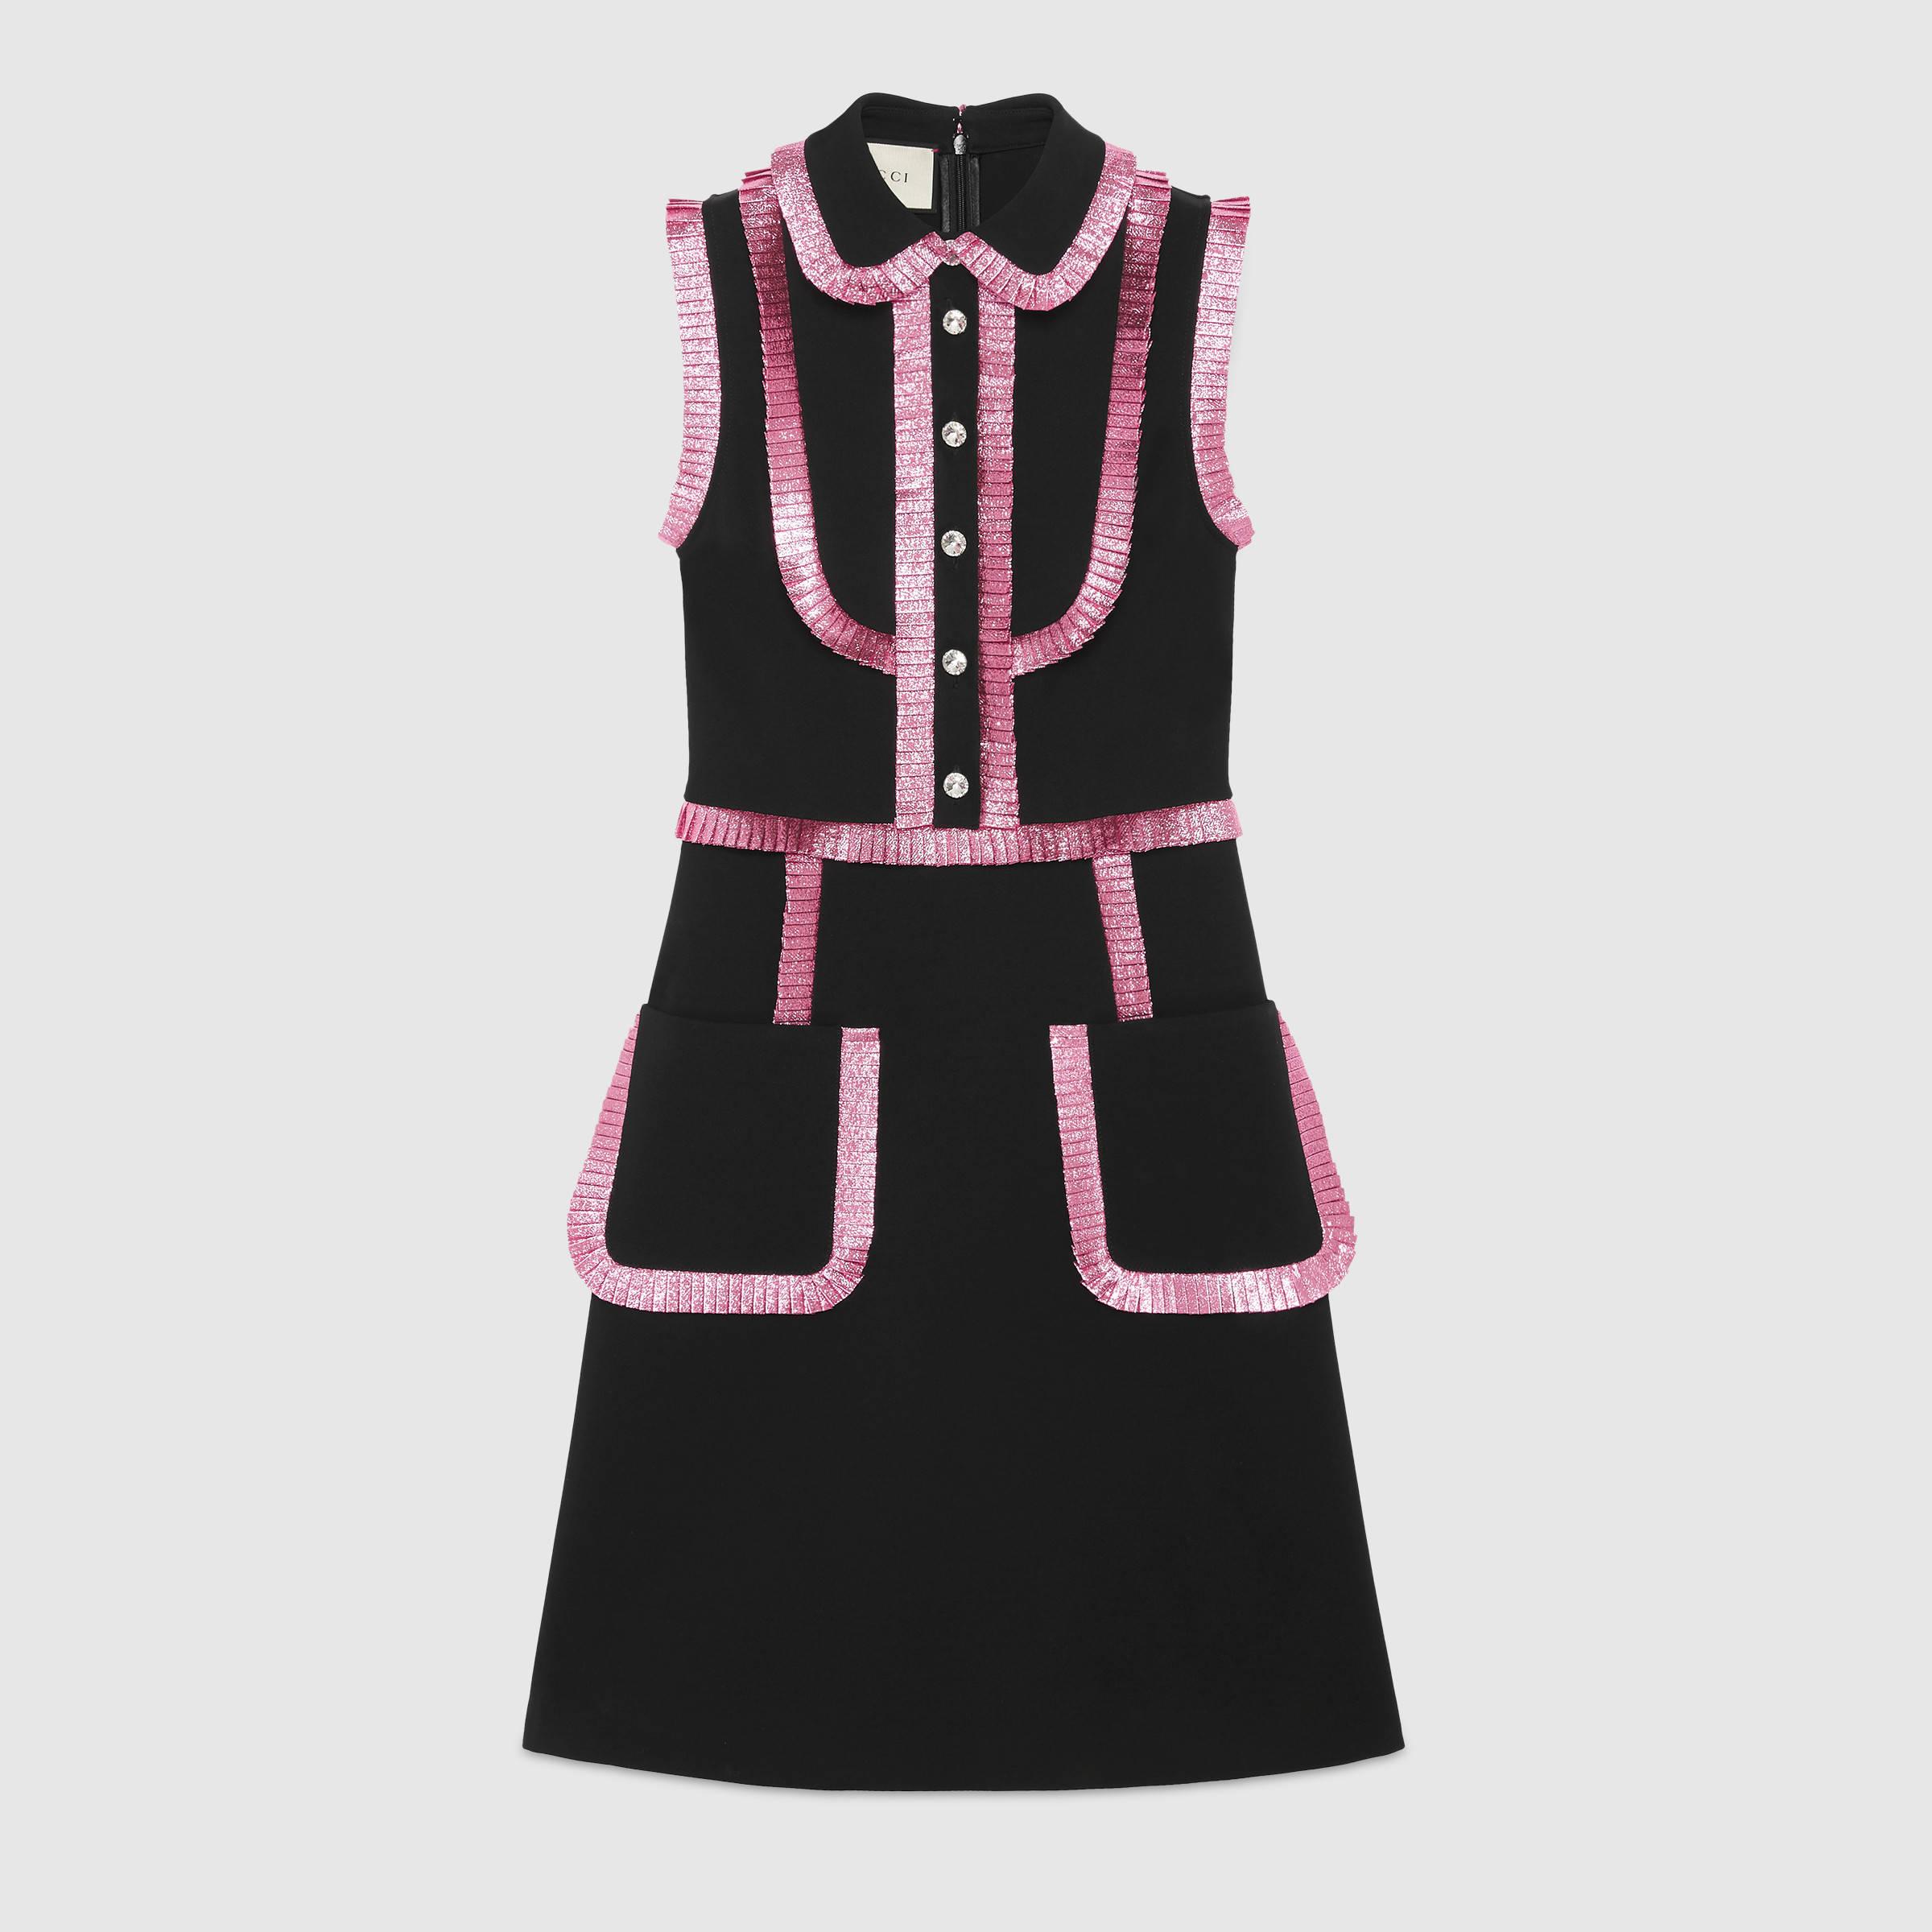 My Gucci Wardrobe – embody la mode